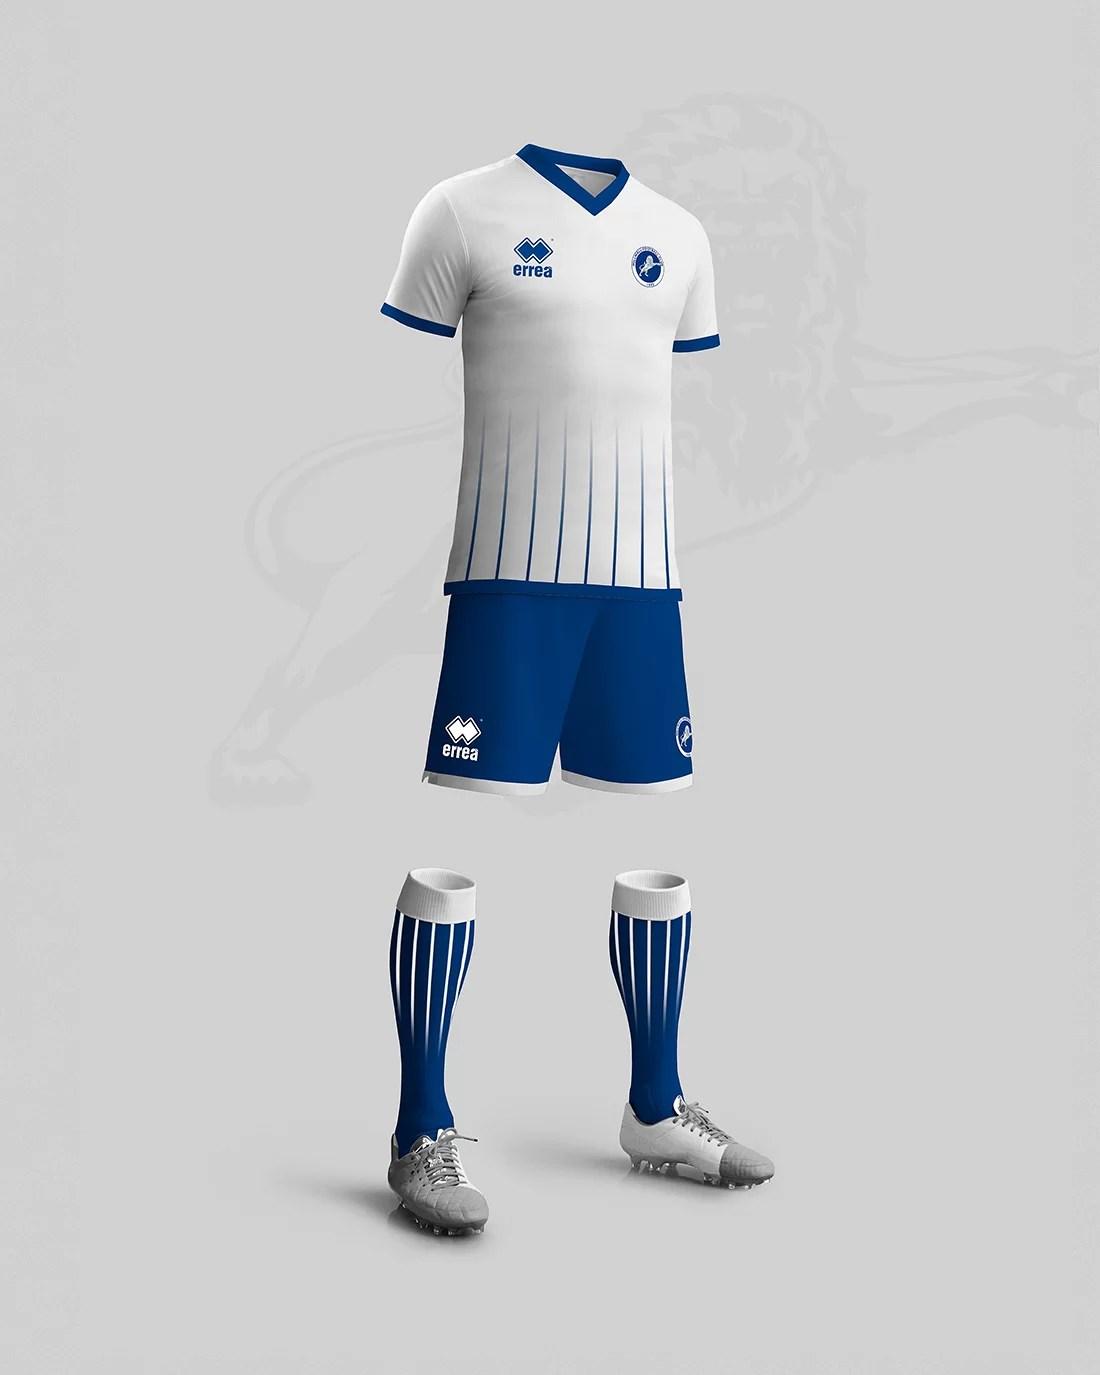 Stroje piłkarskie Millwall away kit design